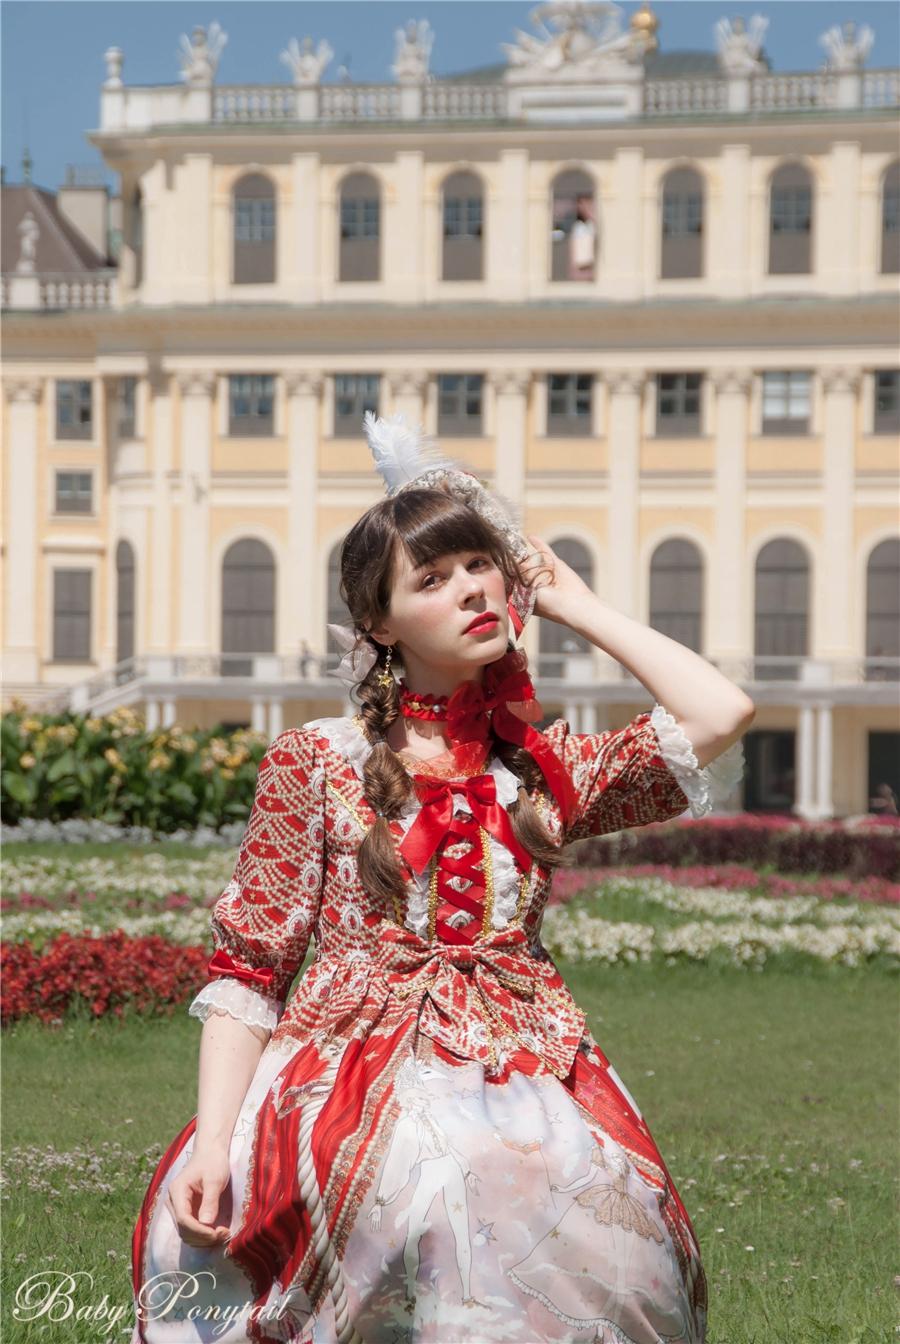 Baby Ponytail Masquerade Ballet Red OP_Claudia_08.jpg